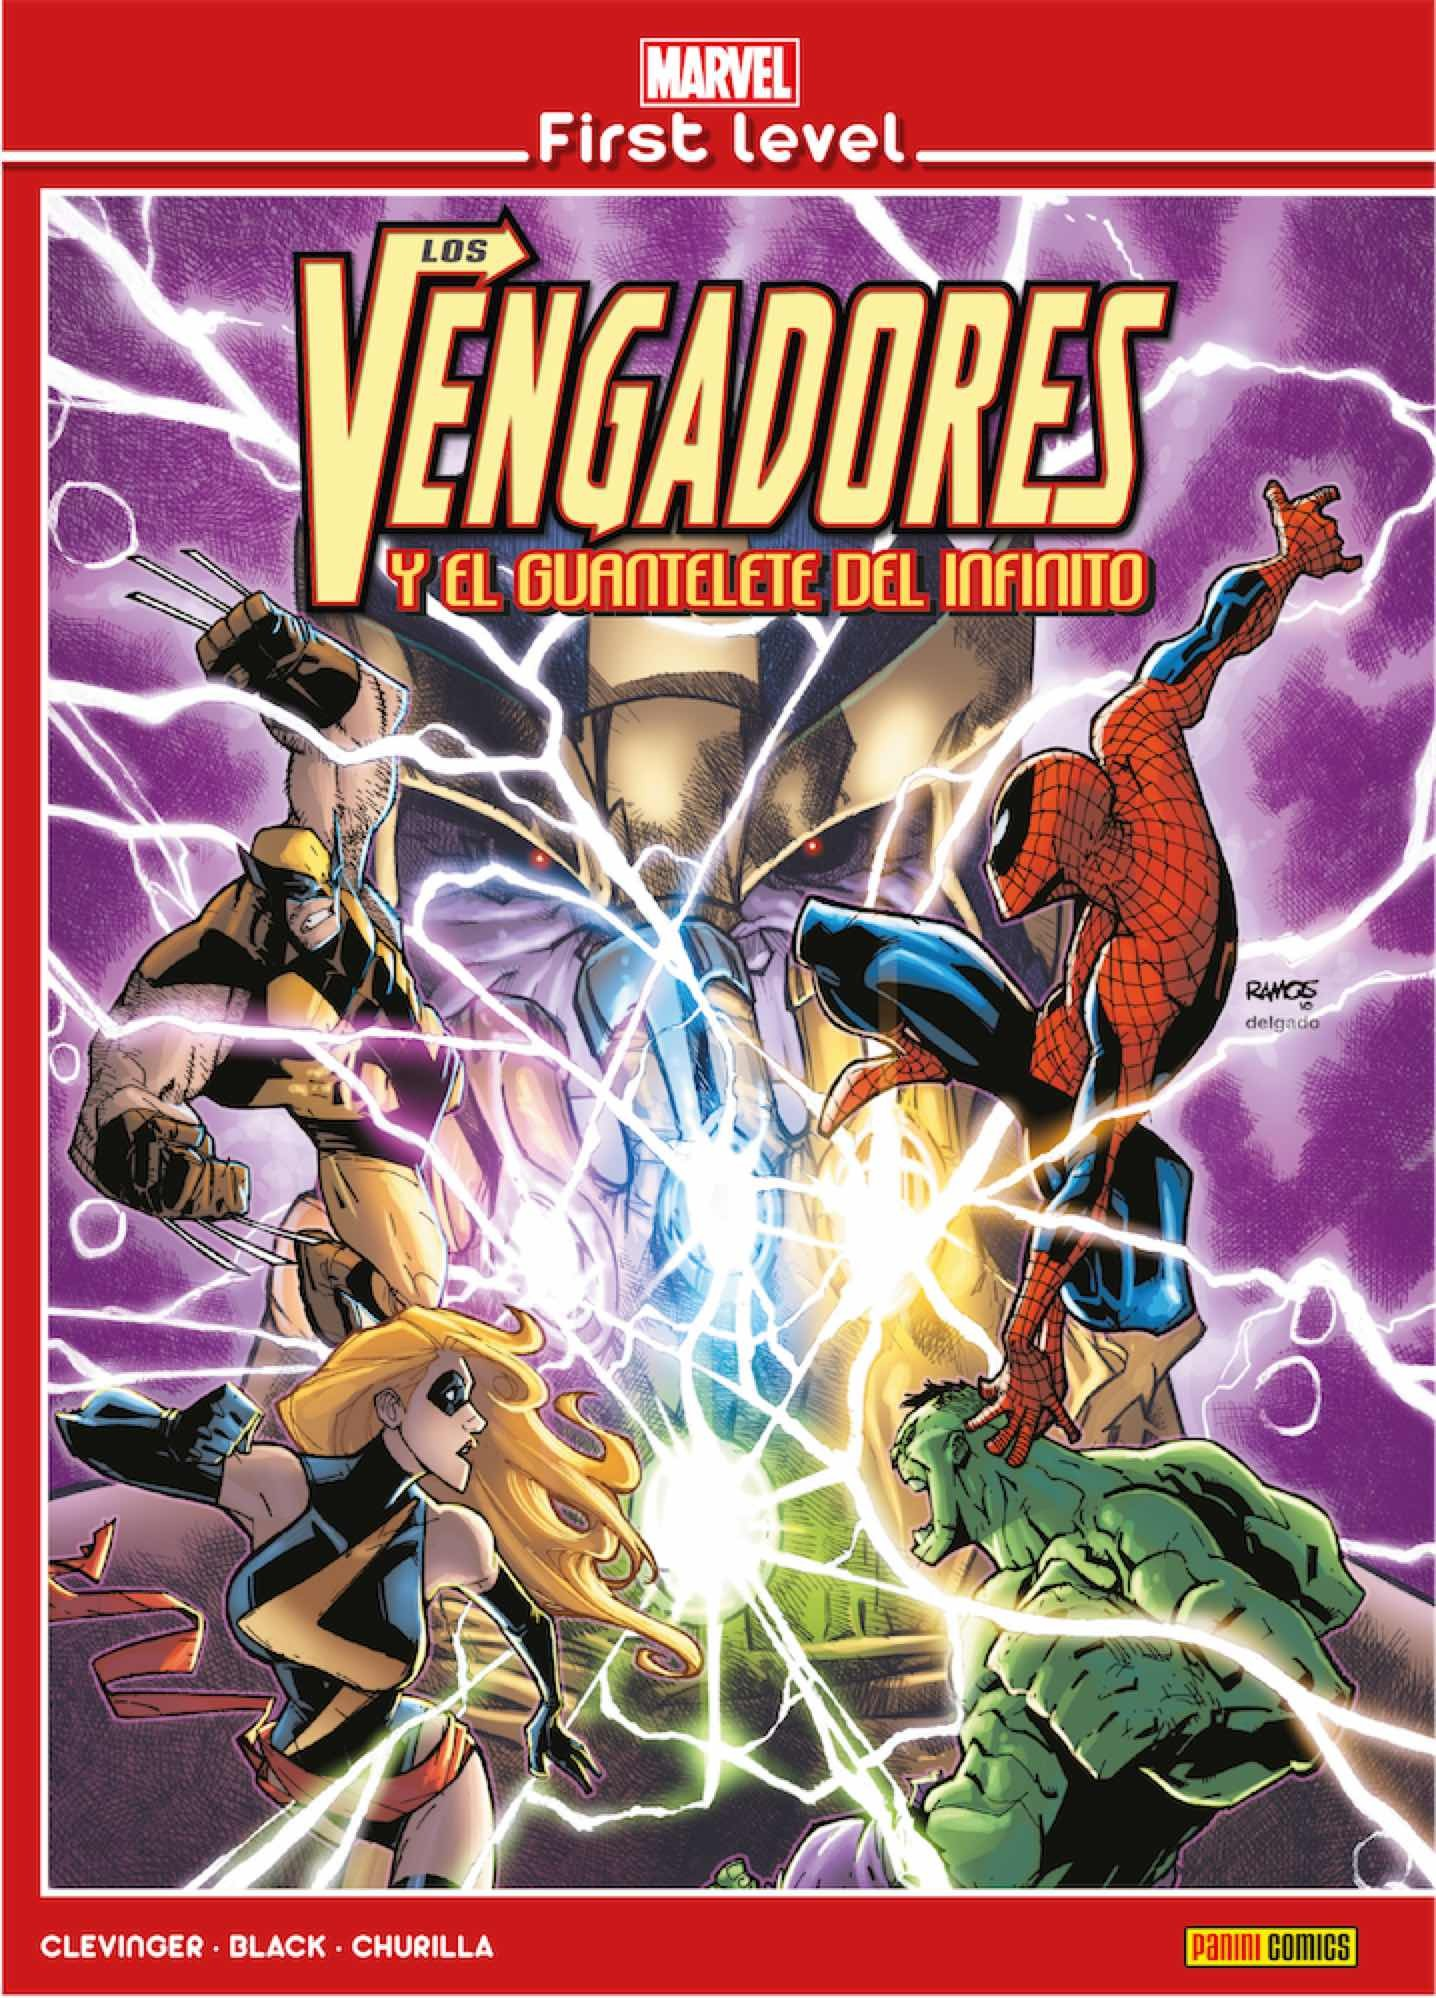 Marvel First Level nº 01: Los Vengadores y el Guantelete del Infinito -  Omega Center Madrid